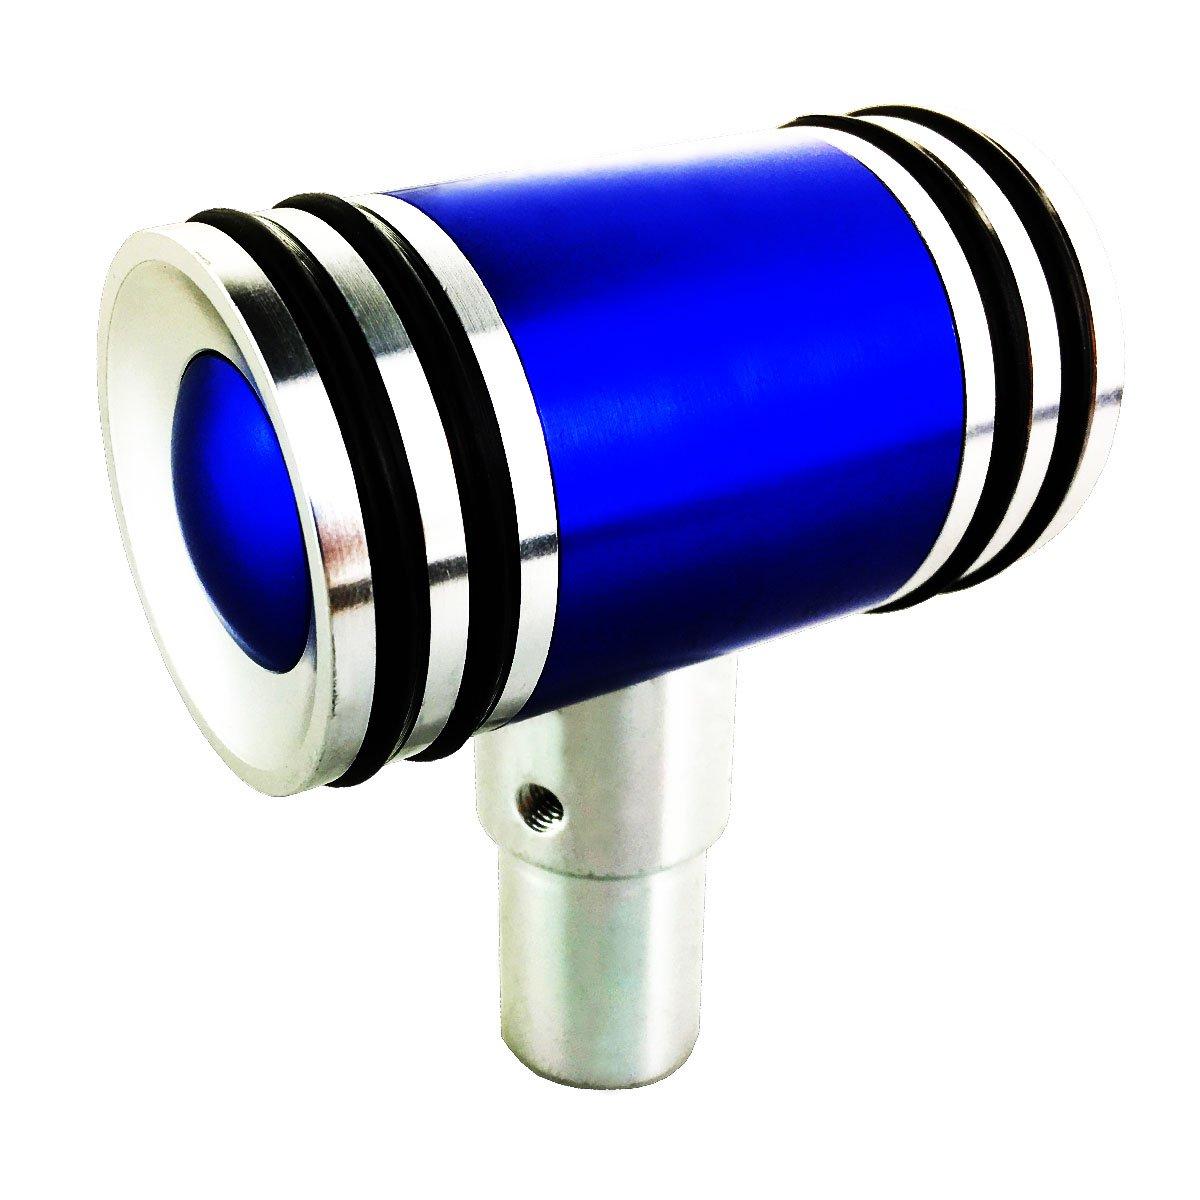 Abfer Automatic Stick Shift Knob Car Handle Shifter Blue Gear Shift Knobs Universal Aircraft Joystick Style Stick Shifter